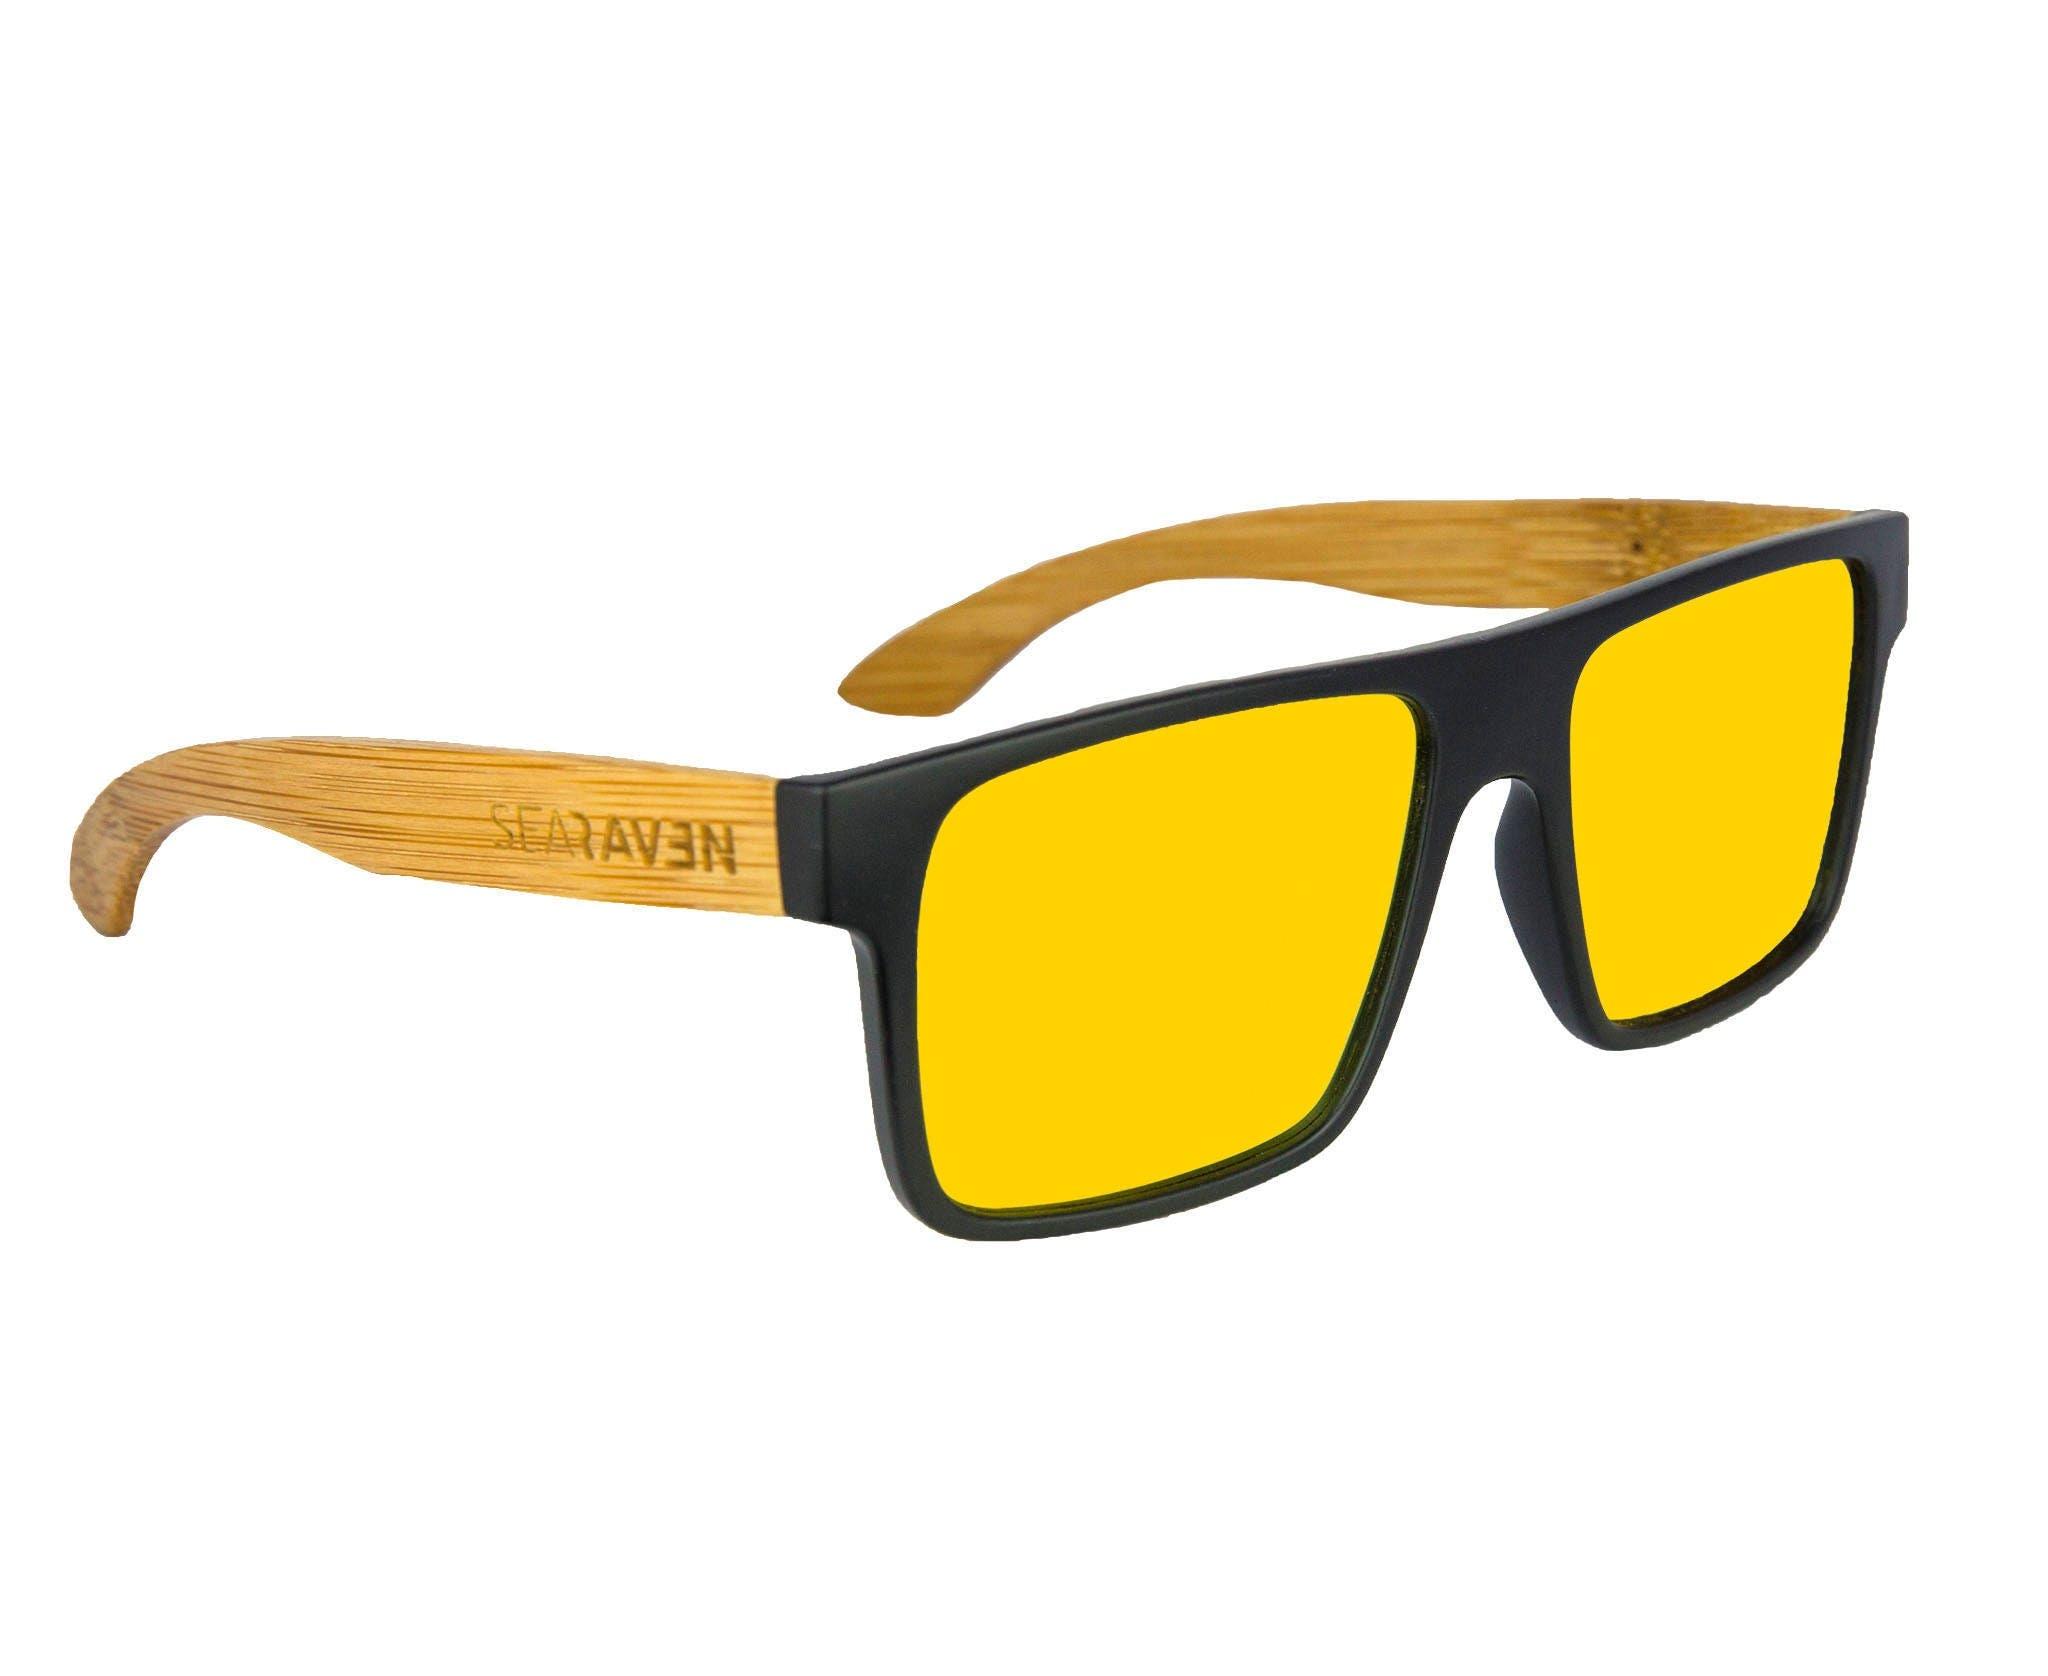 fbd2272824 Wooden Sunglasses